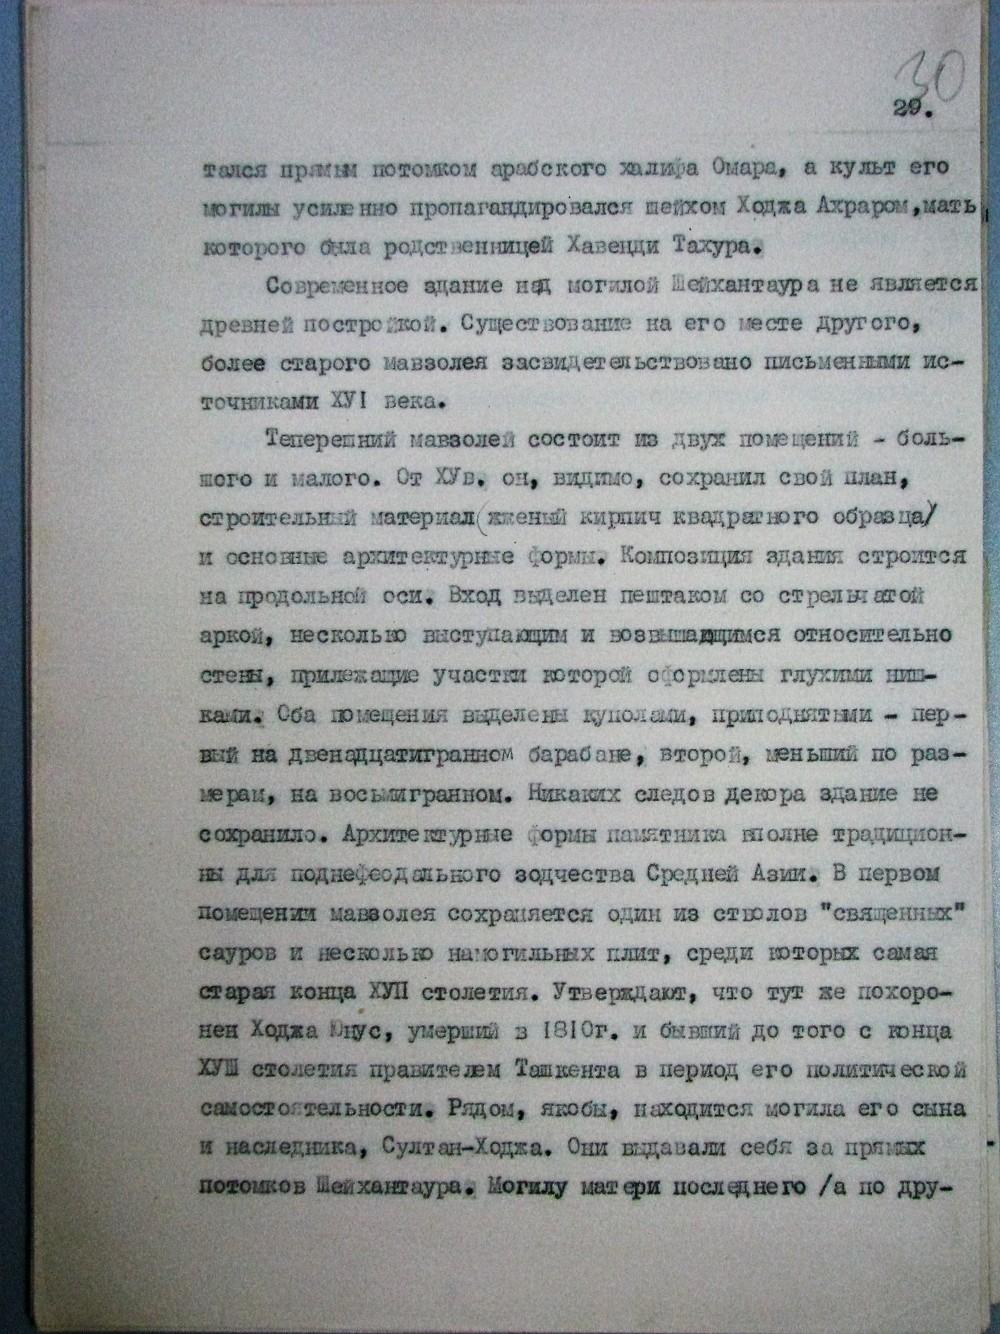 Ташкент, Массон (28)